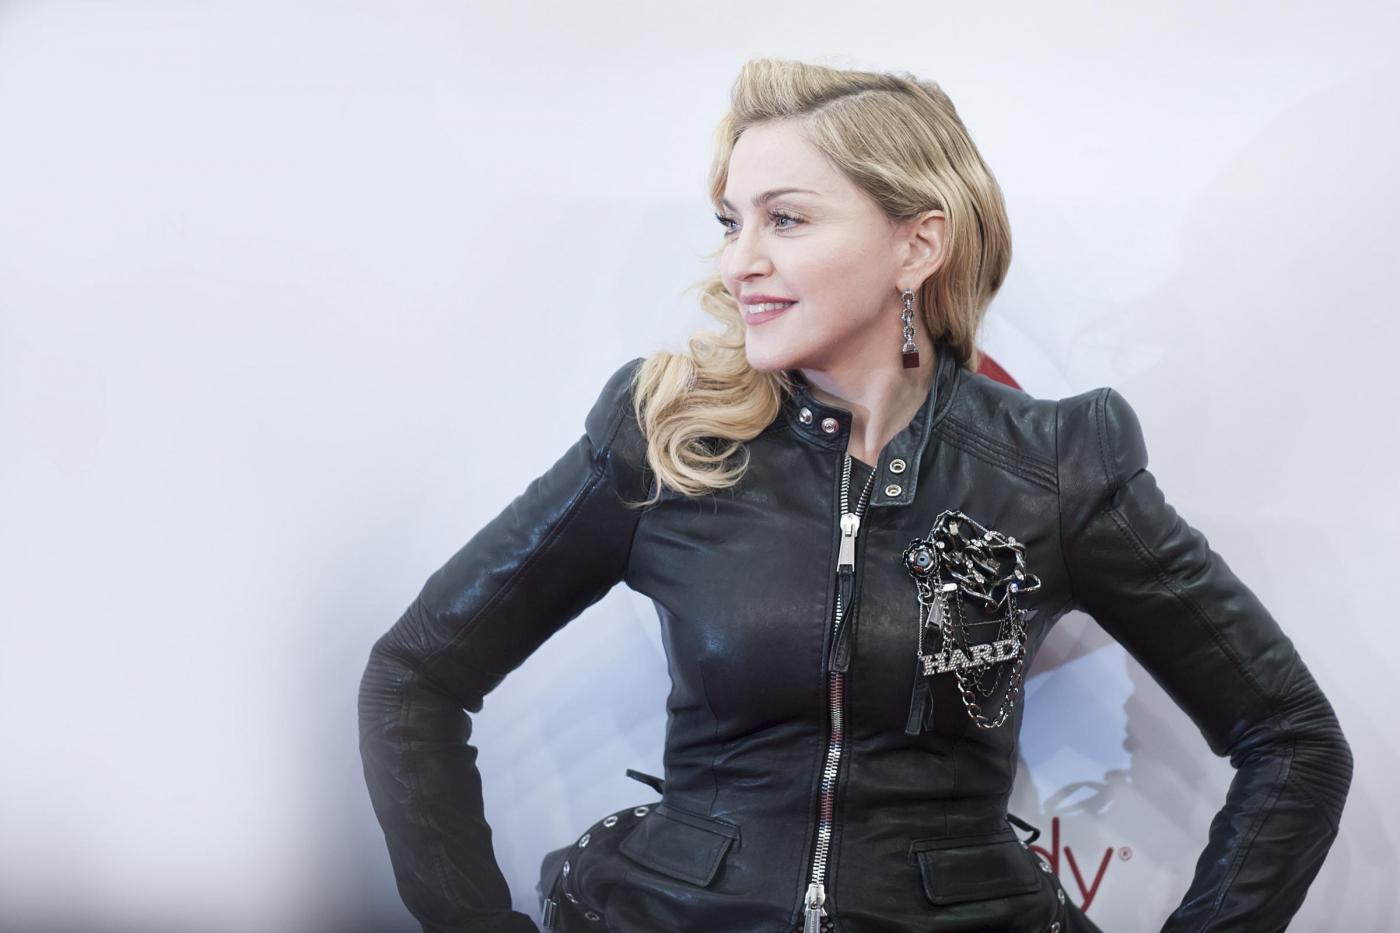 Erffnung von Madonnas Hard Candy Fitness Club in Berlin Madonna apre la sua palestra a Berlino05